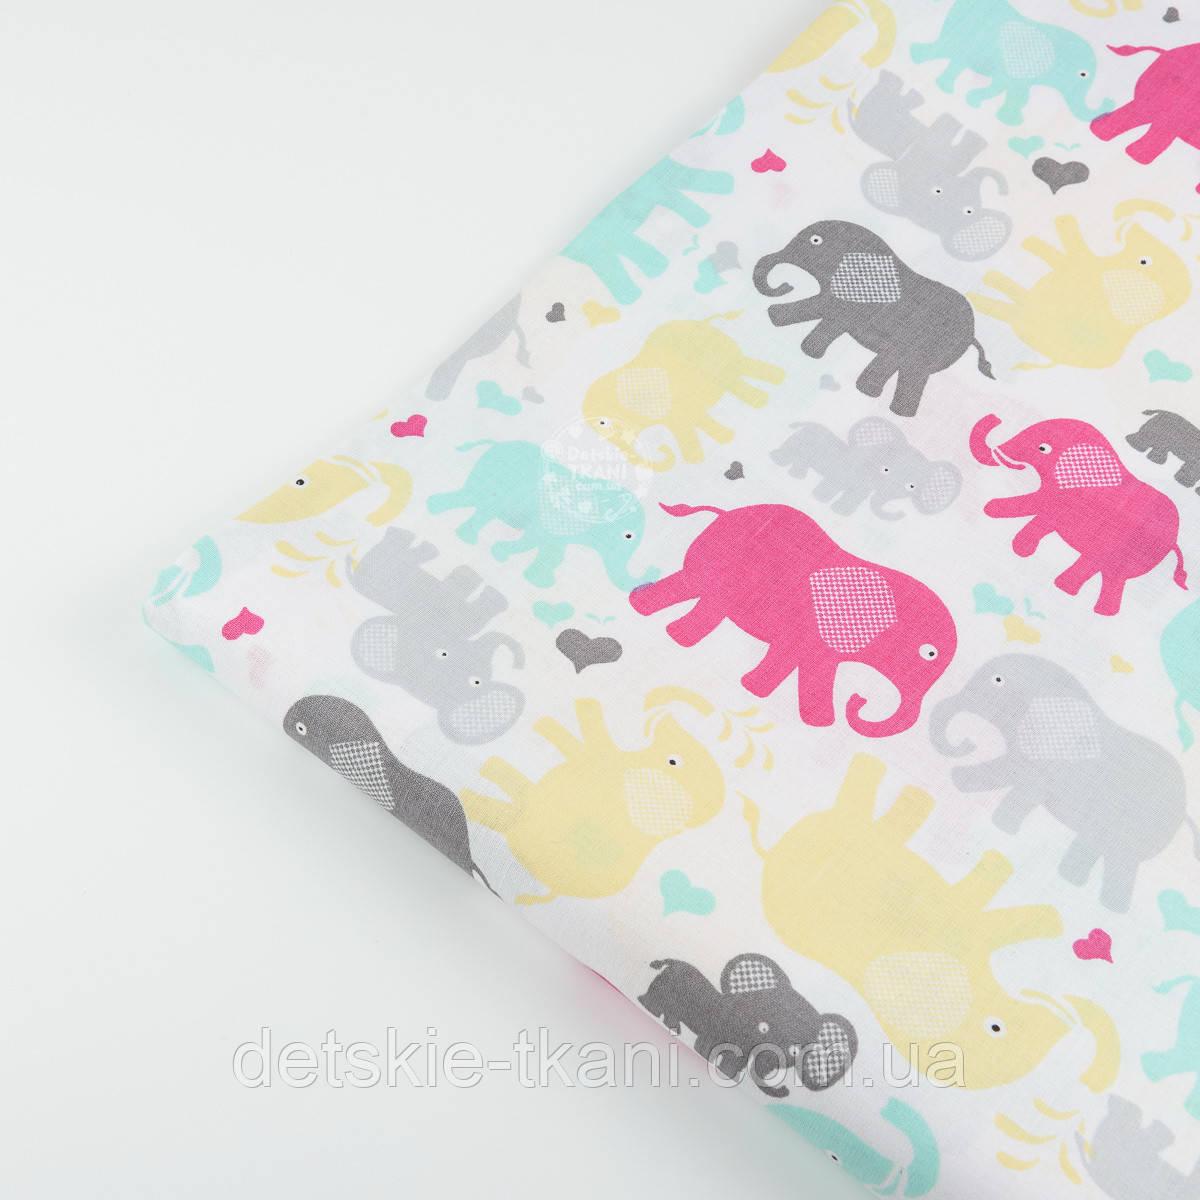 Лоскут ткани №233 размером 34*79 см